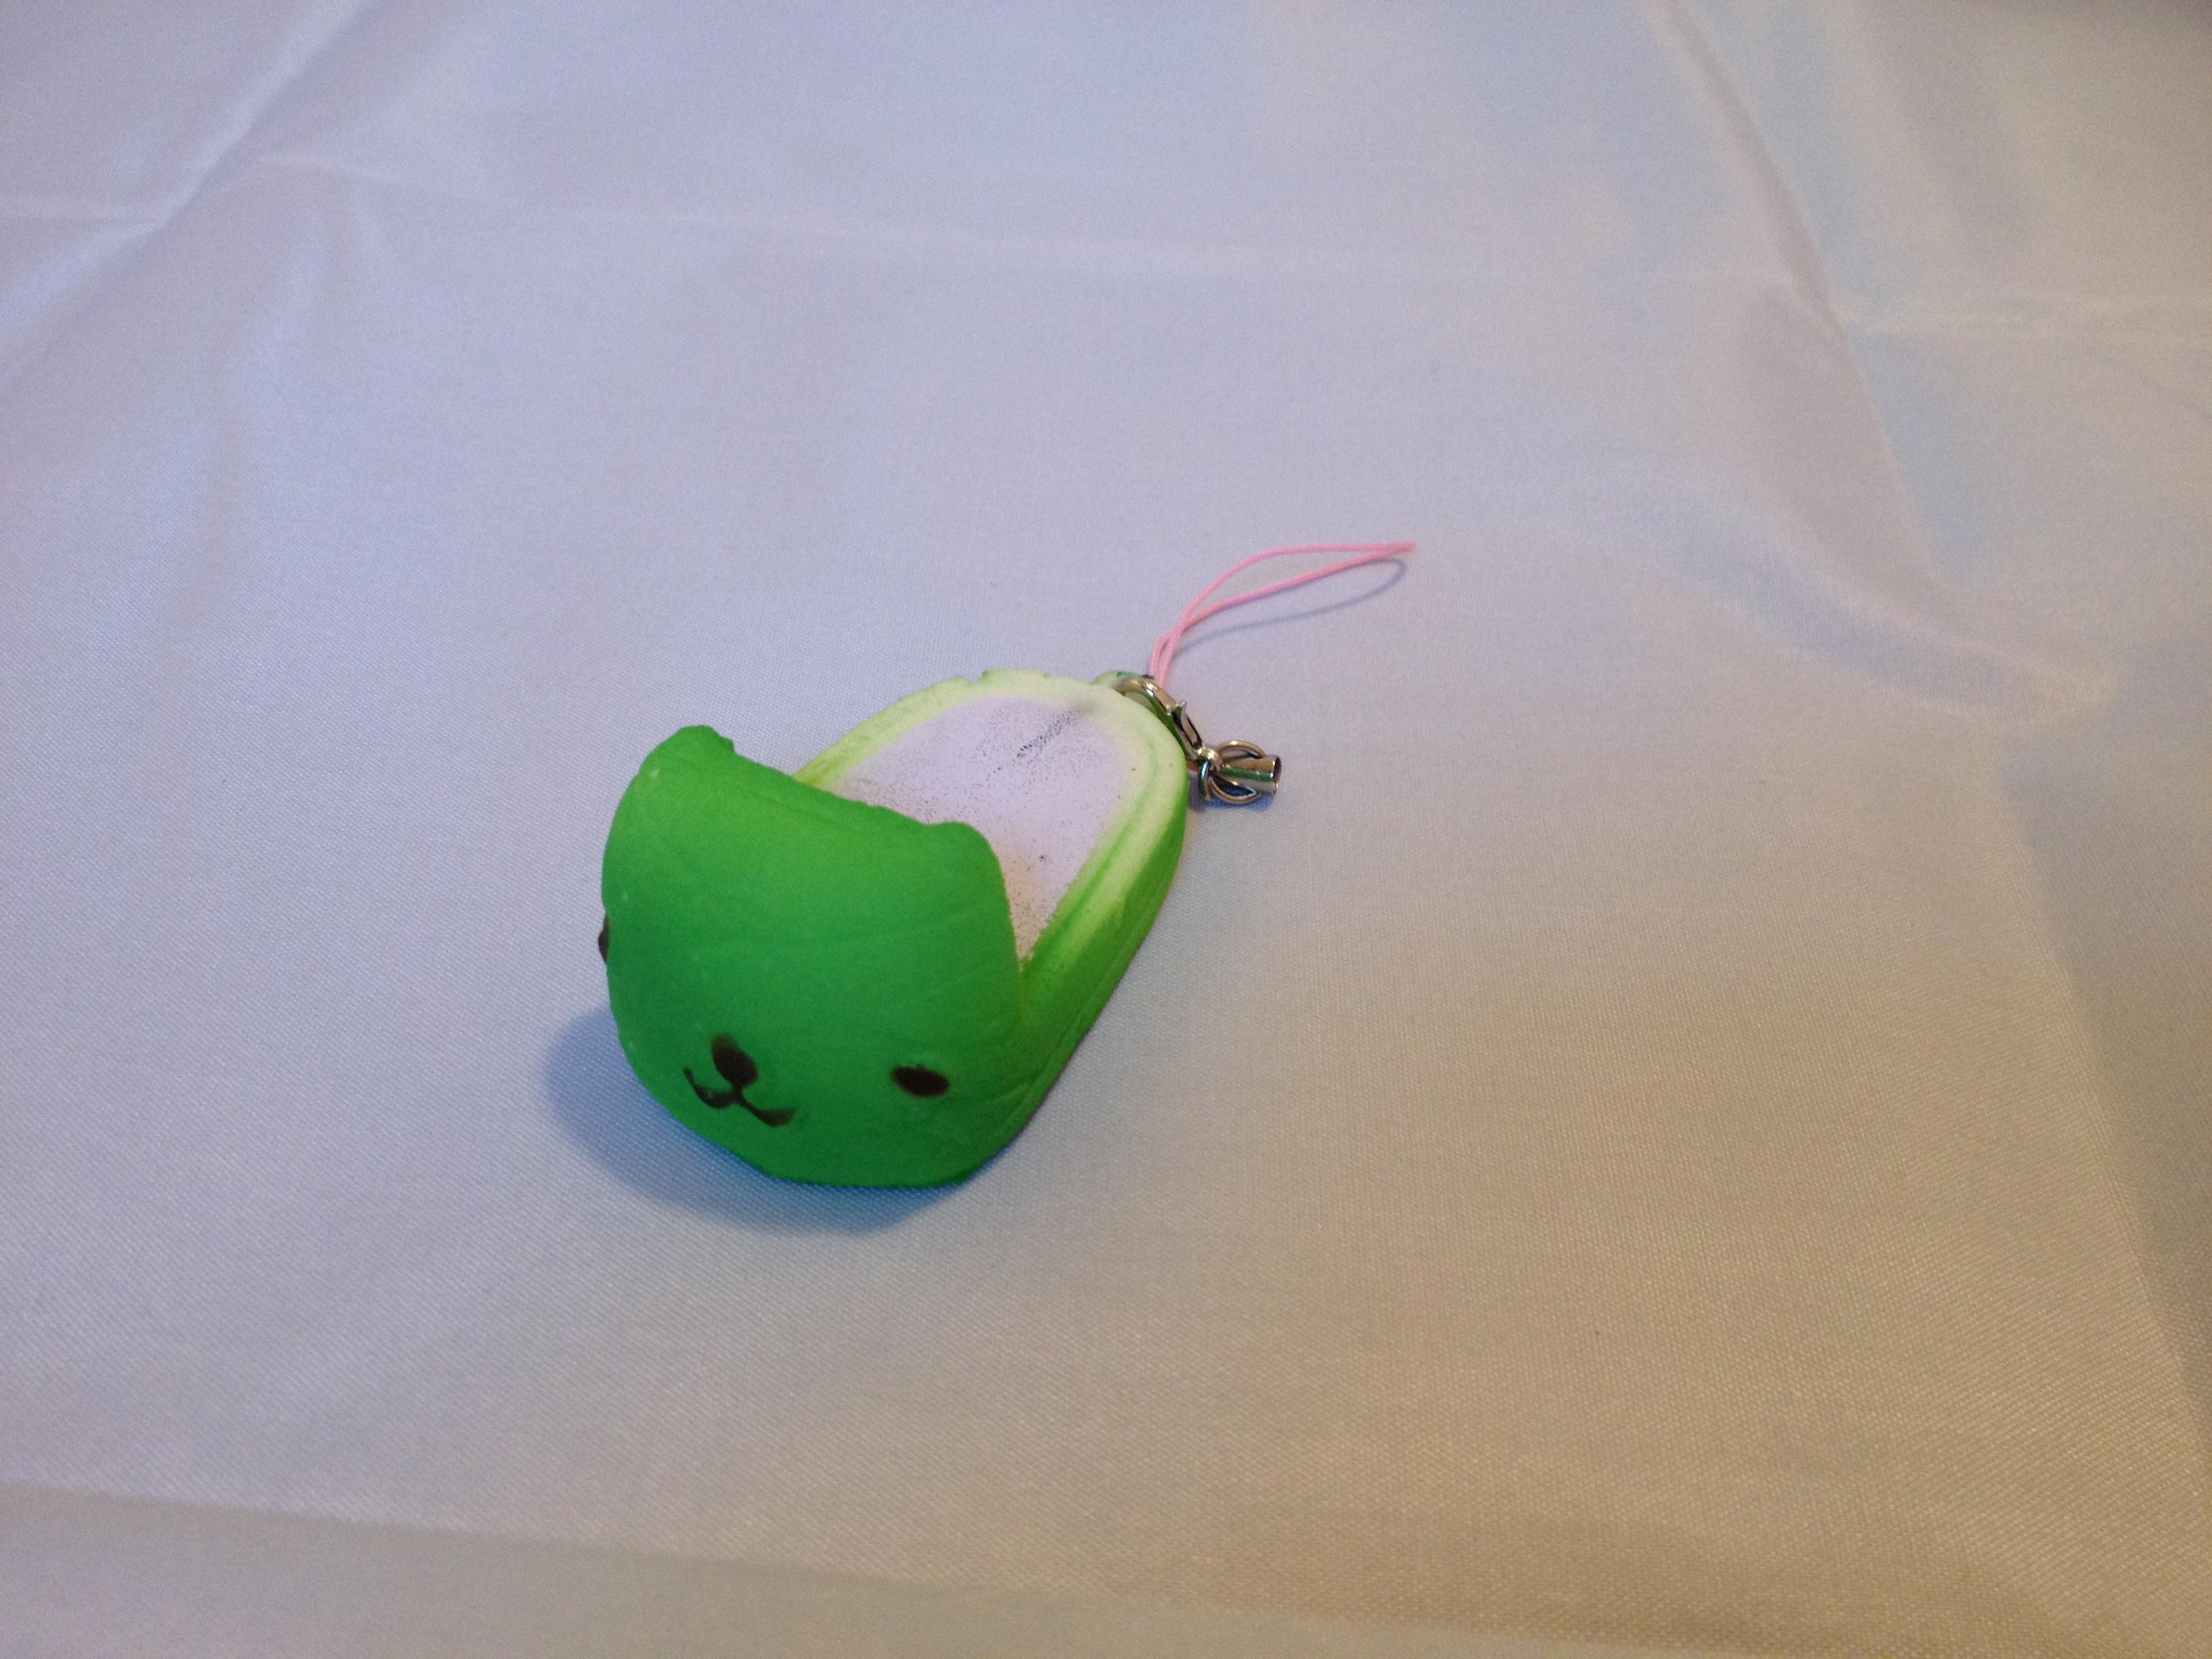 Green Squishy Toys : Mini Green Kapibarasan Slipper Squishy ? Tiki Tembo ? Online Store Powered by Storenvy